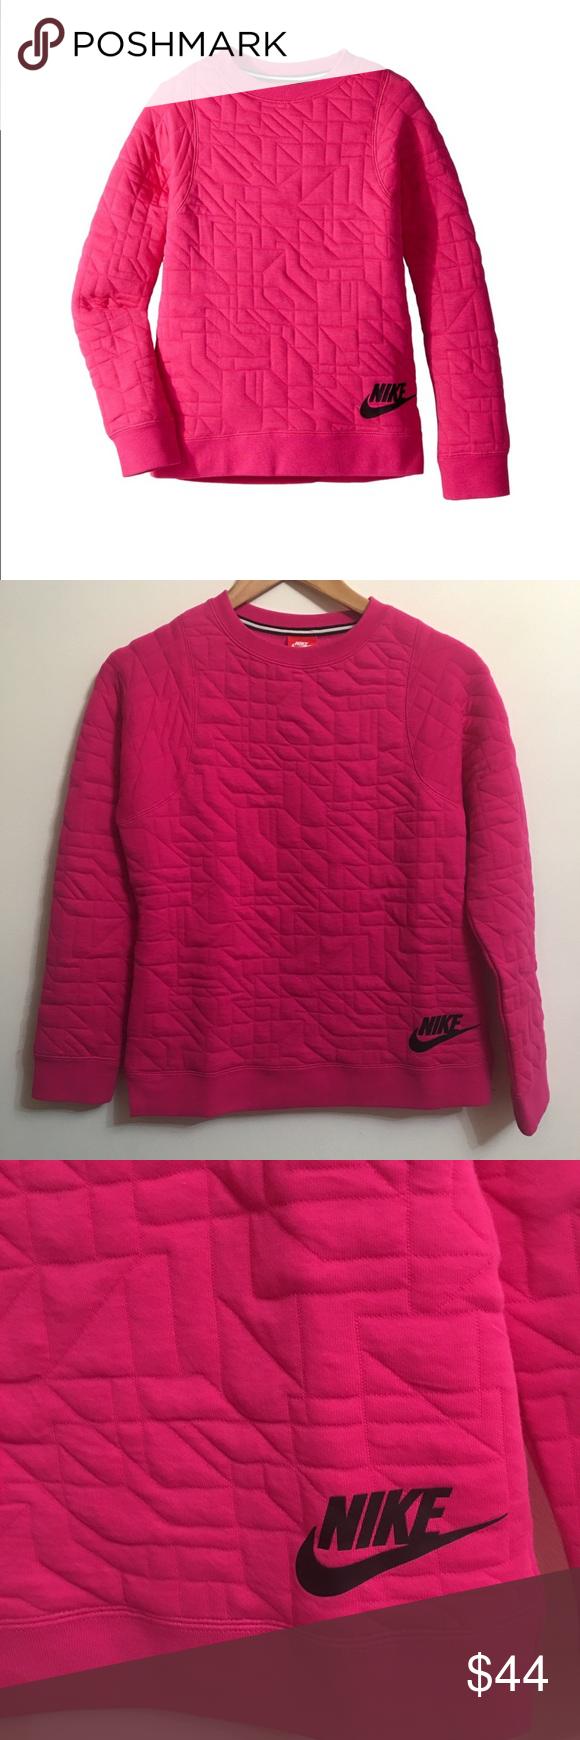 Nike crew for girls sportswear hot pink and sweatshirt